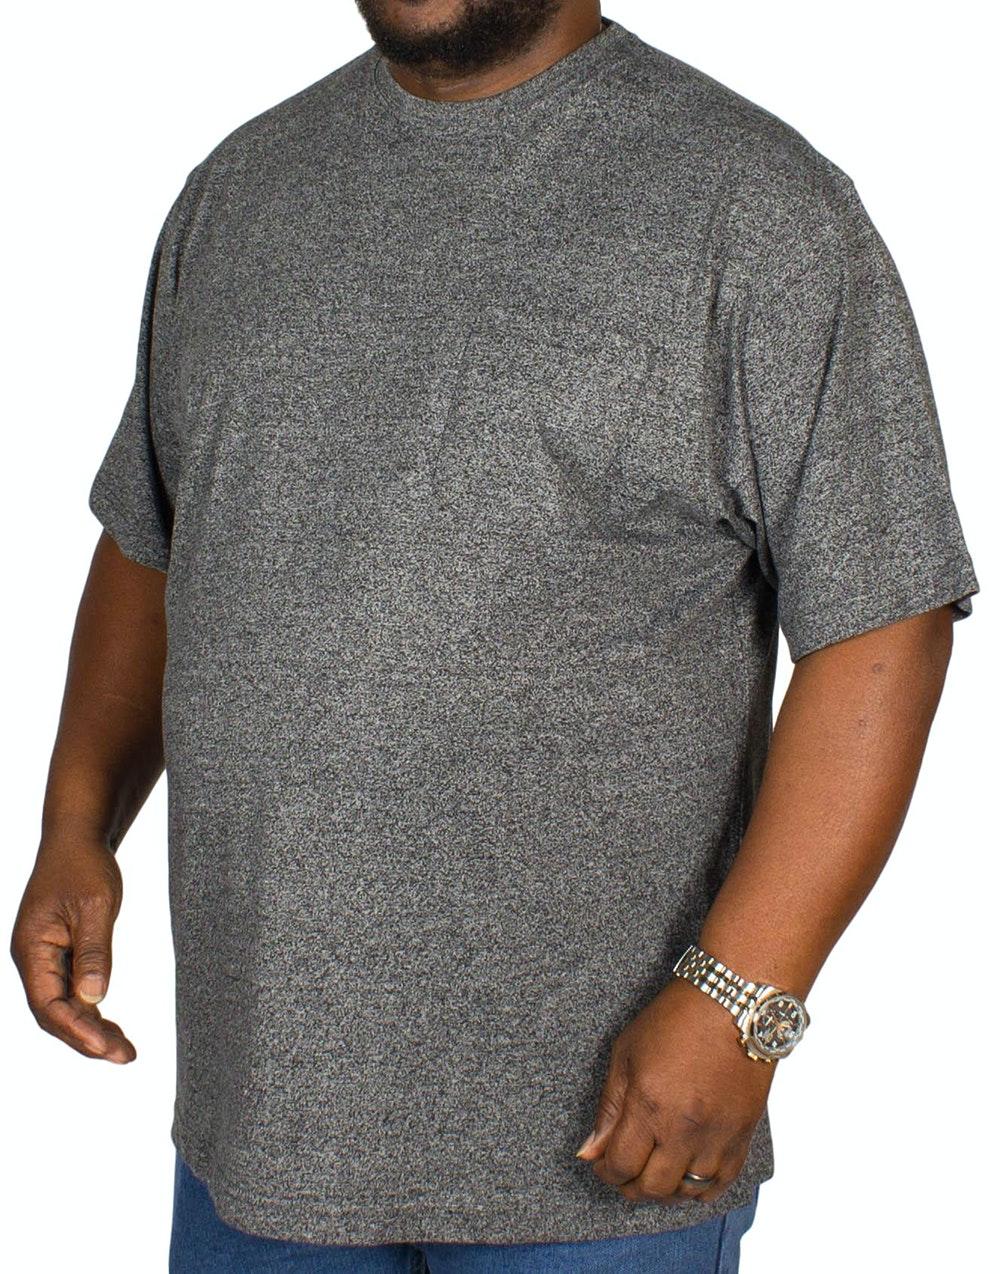 Espionage Jersey Marl T-shirt Charcoal